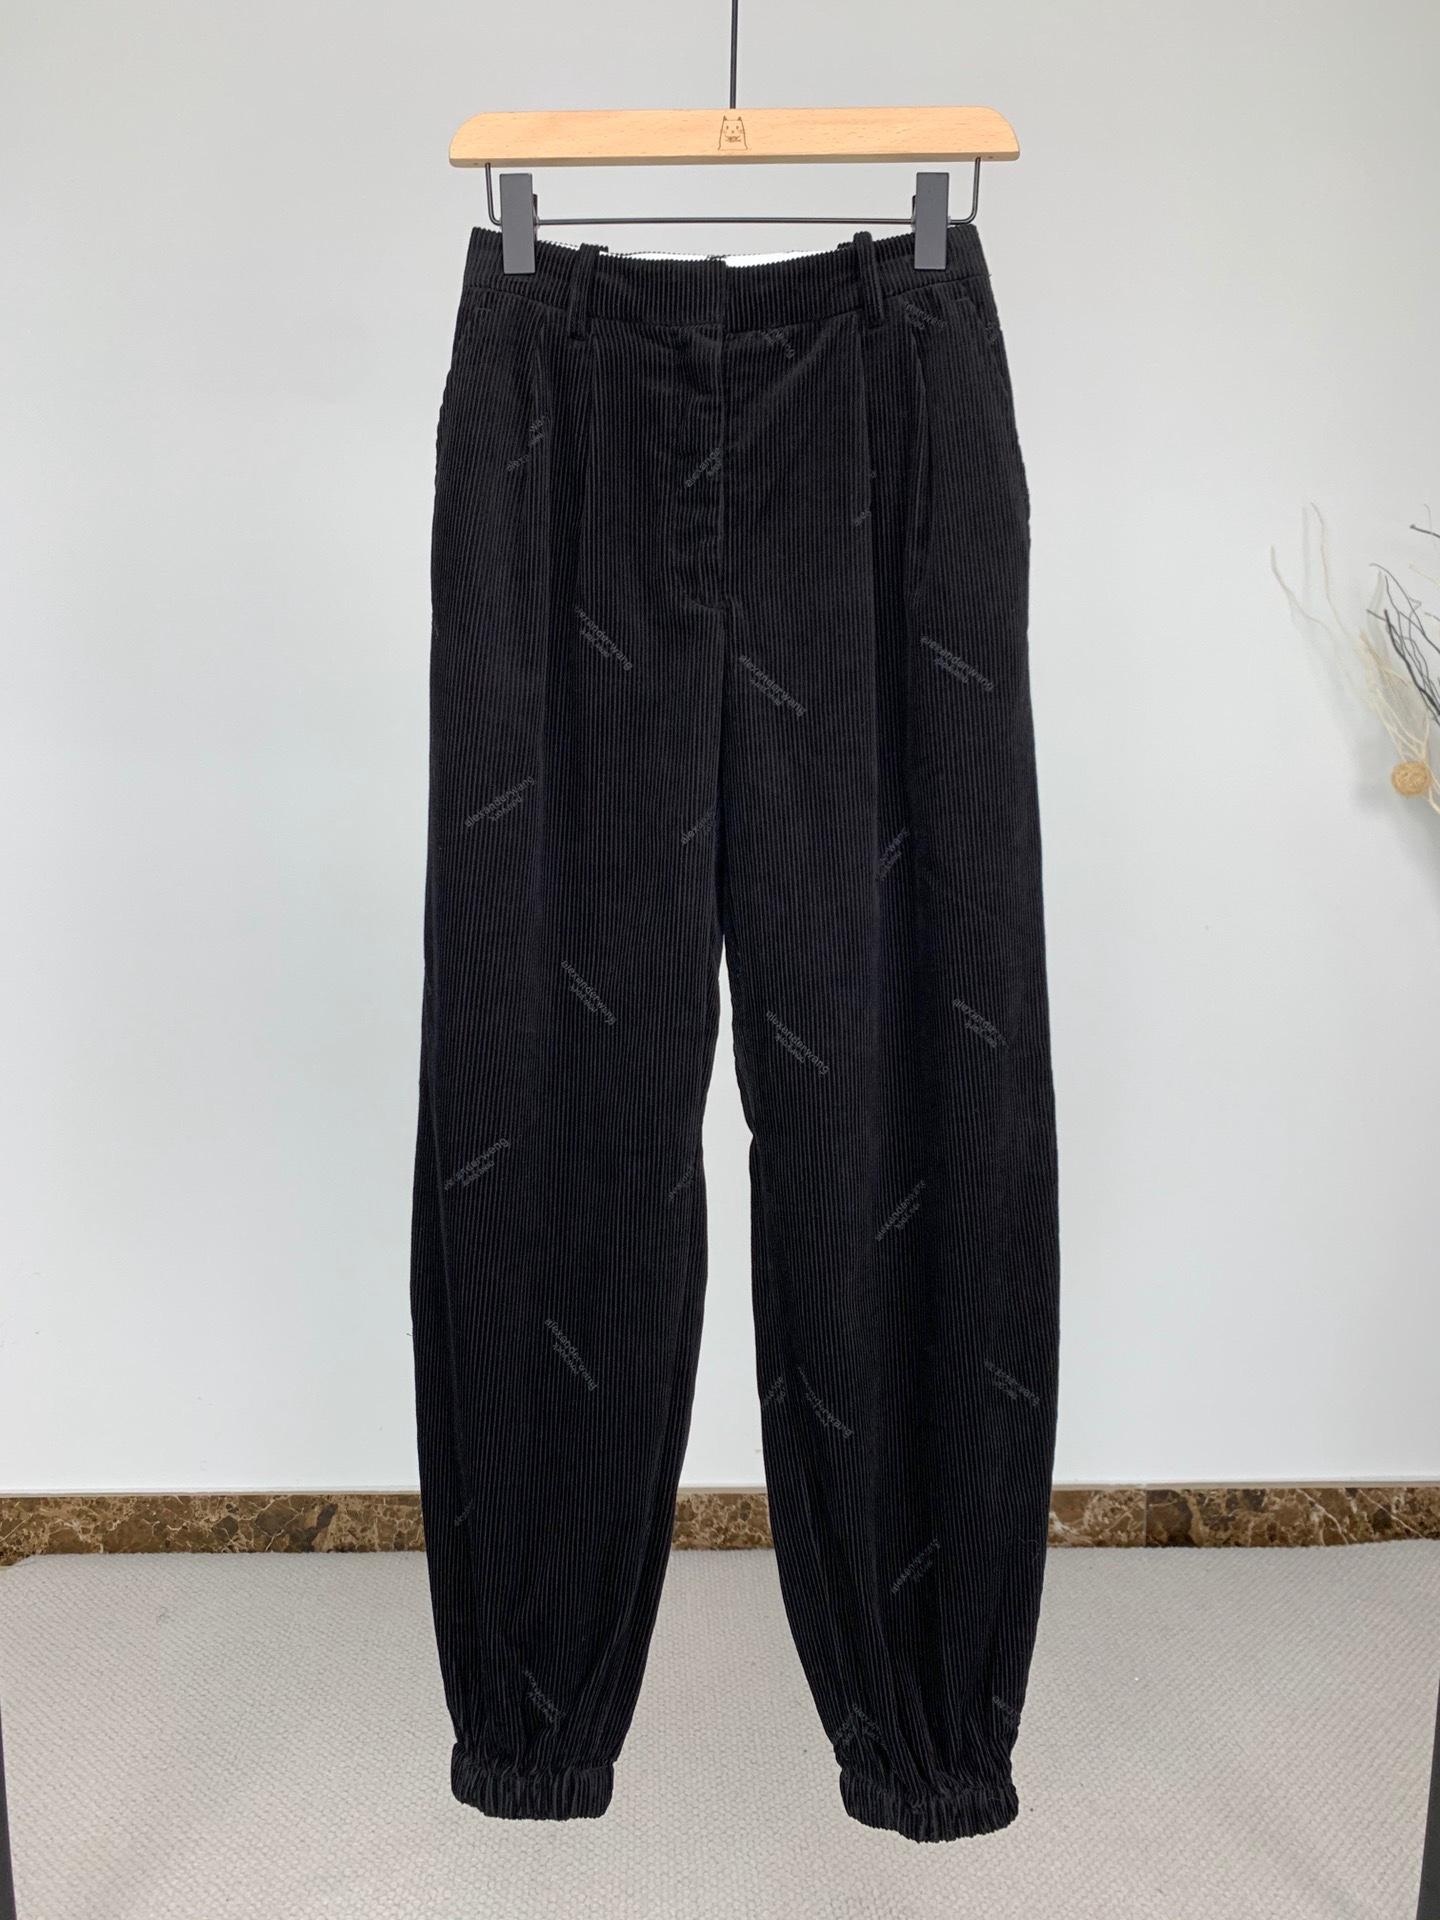 Dawang original tail casual pants womens 21 autumn letter embroidery medium high waist tapered corduroy pants